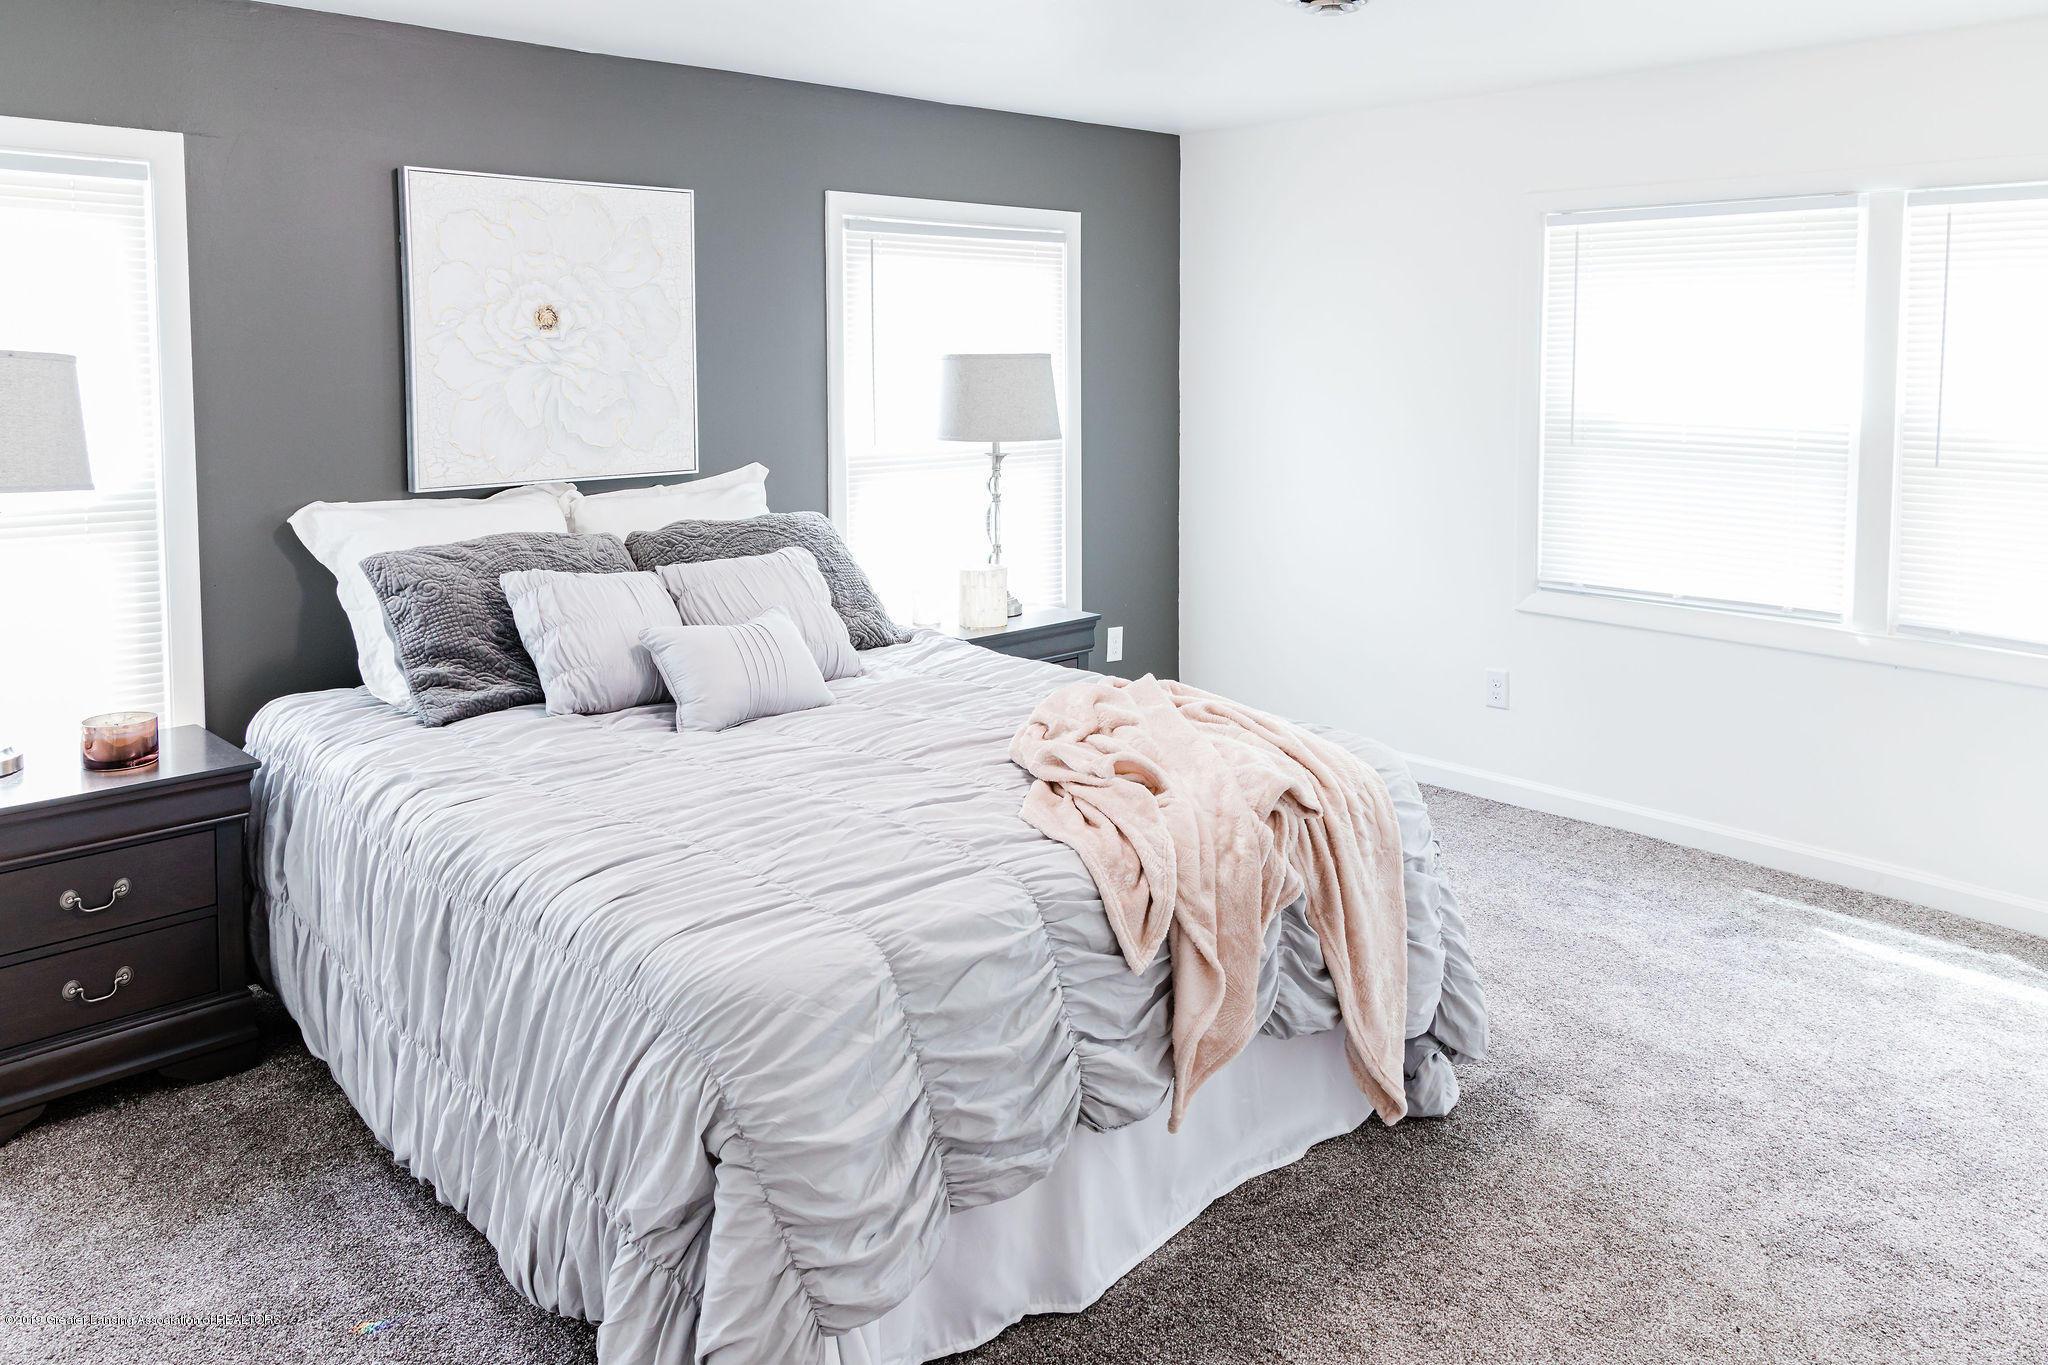 515 Beechwood St - Master Bedroom - 42